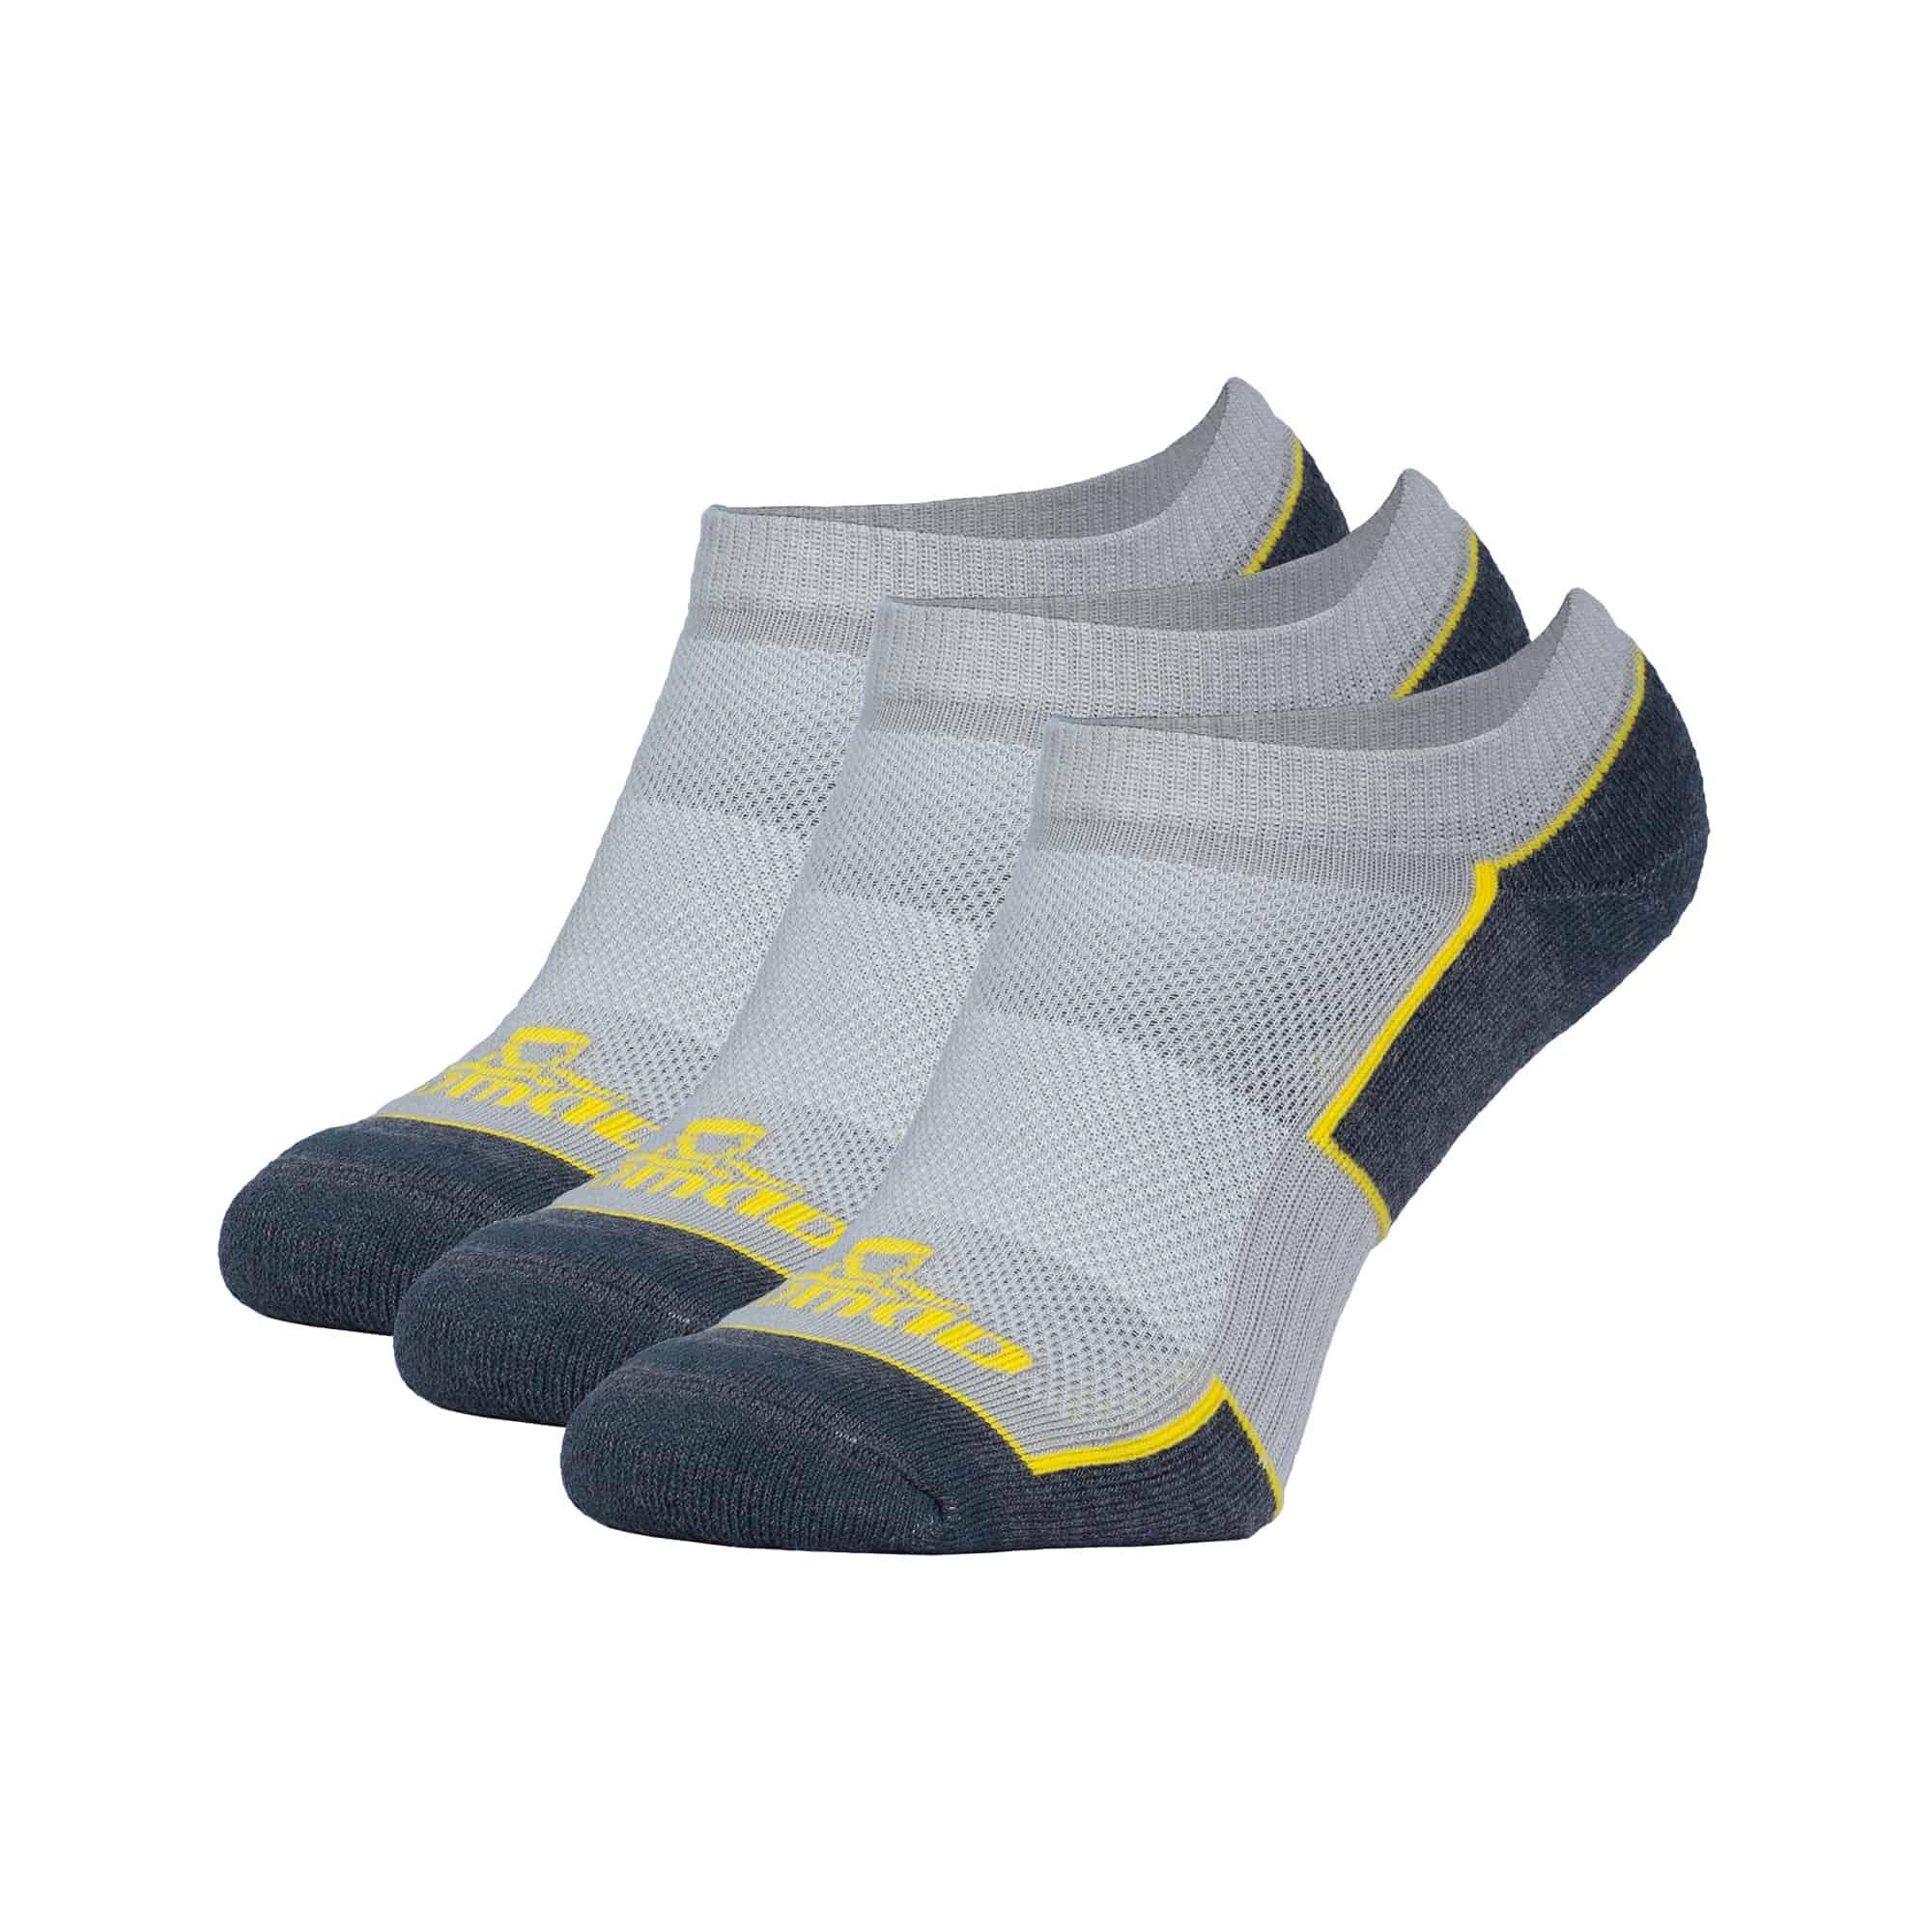 126 grey/yellow